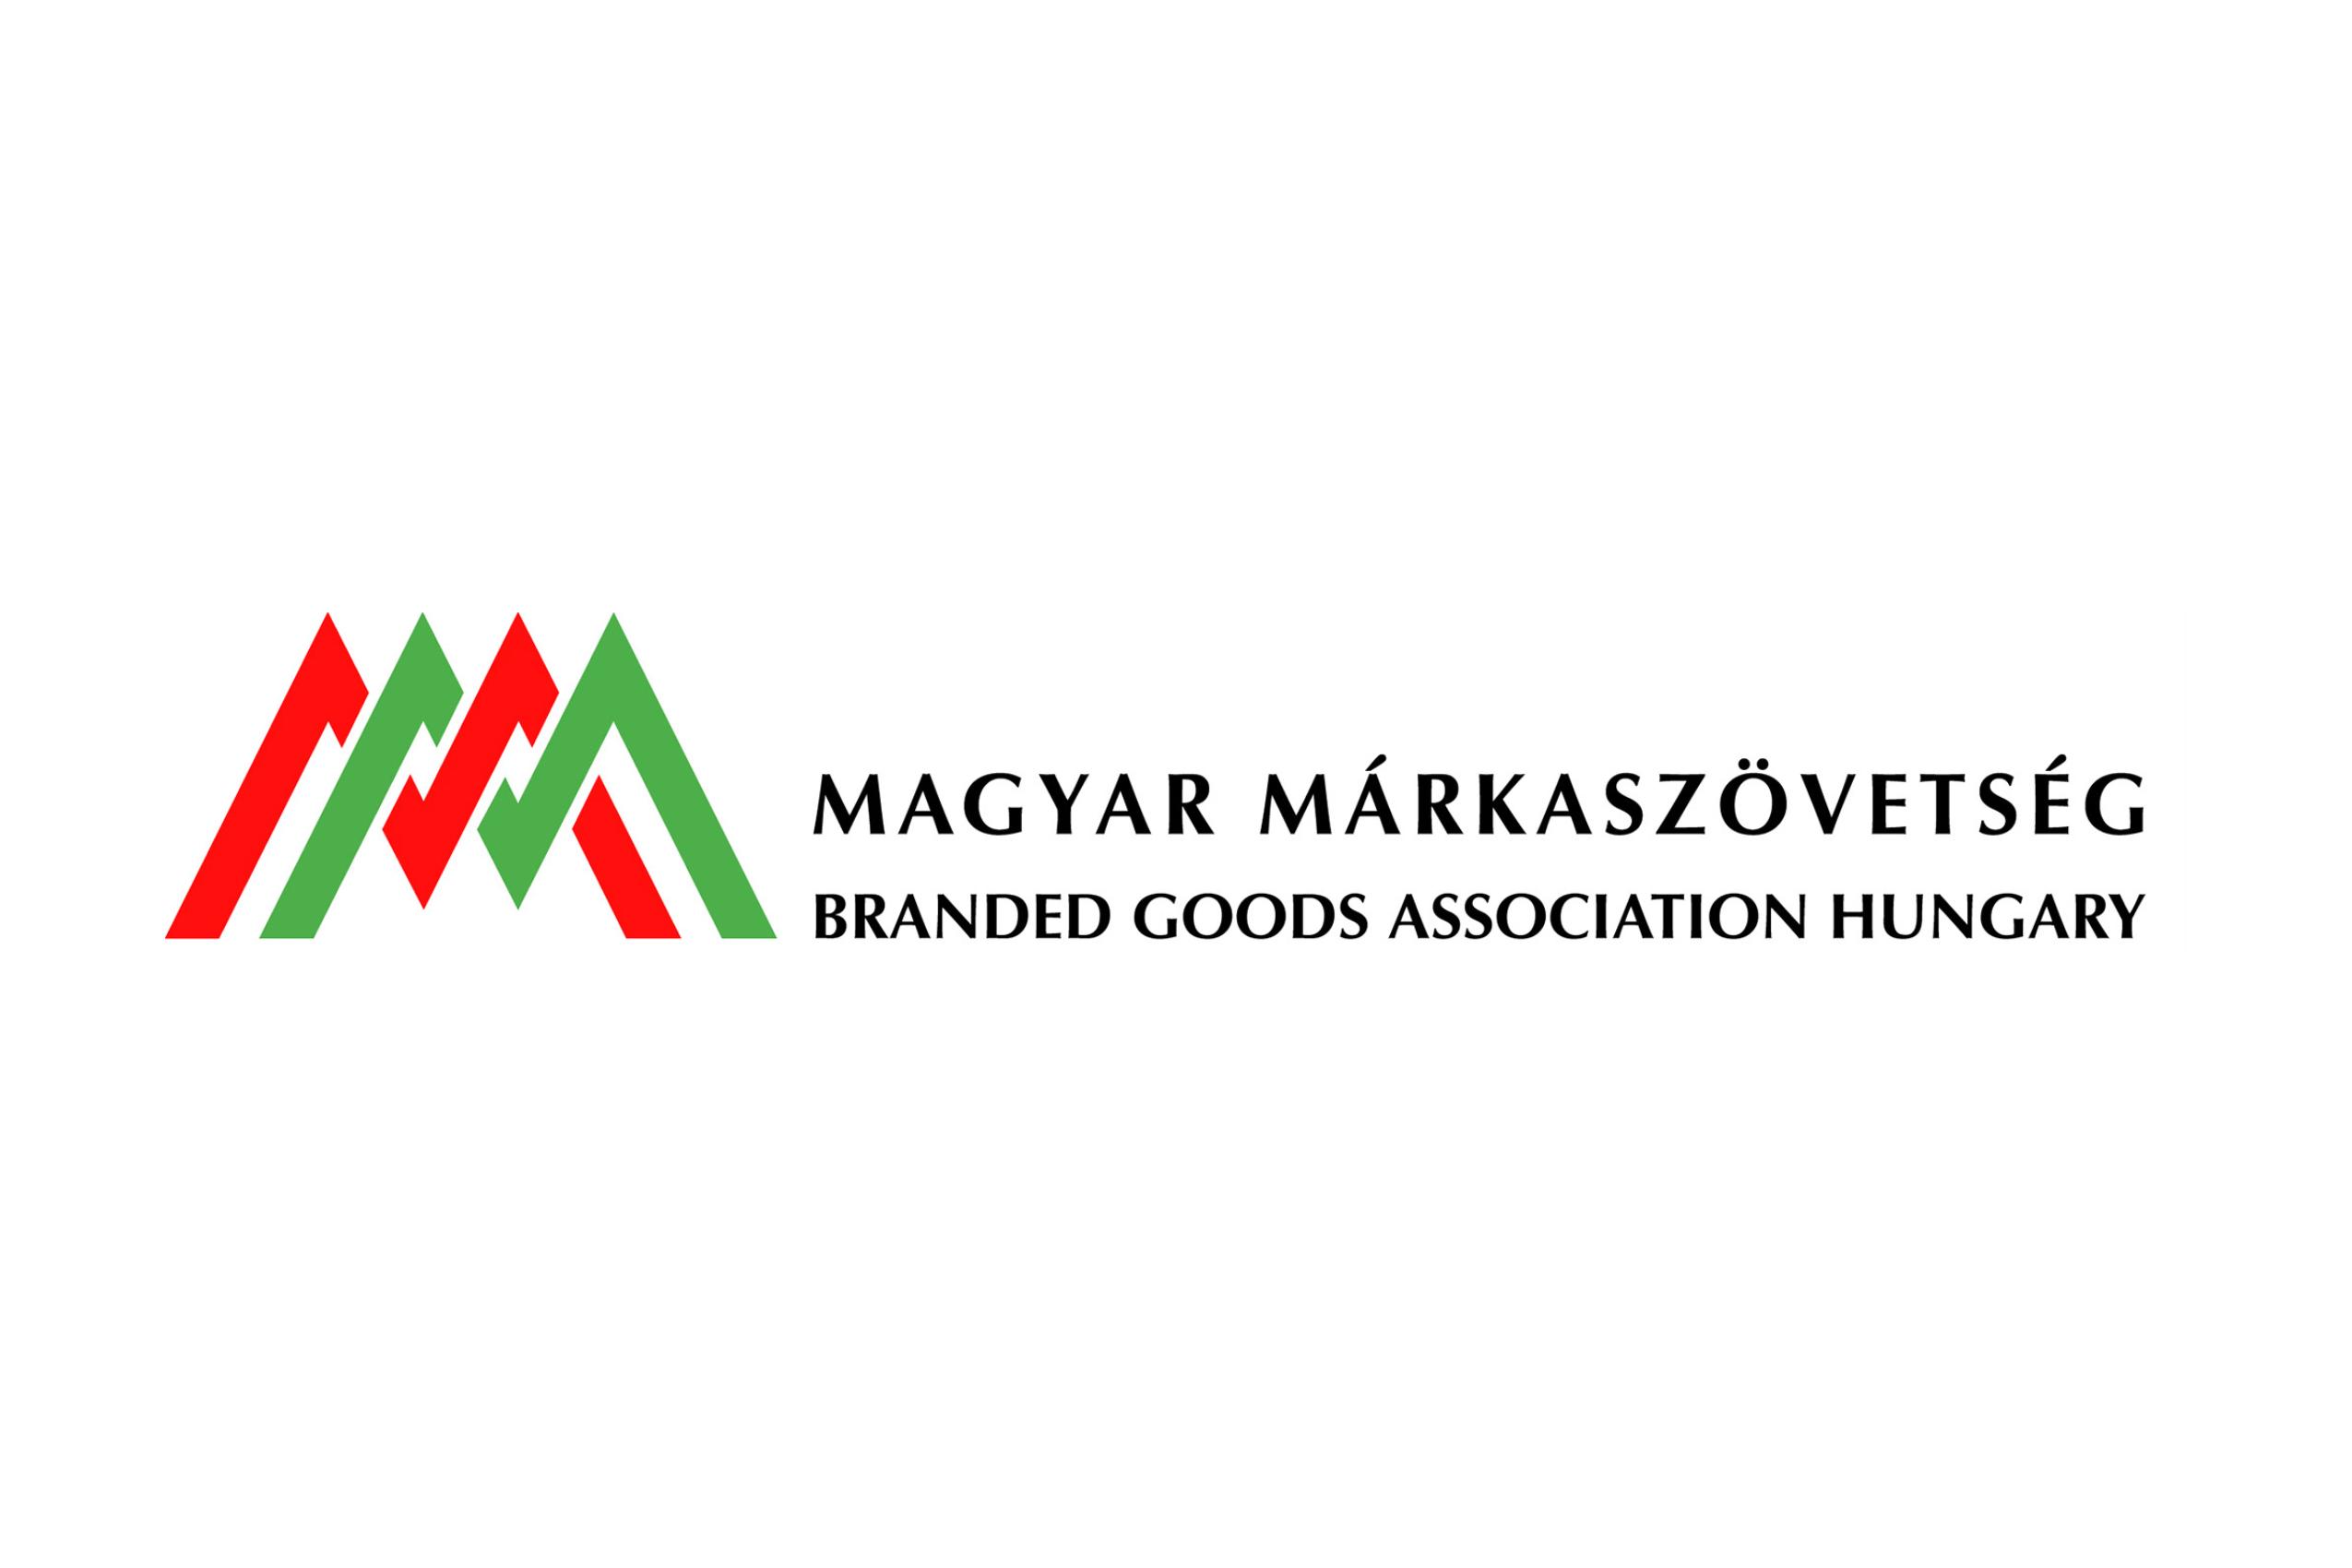 https://europeanplasticspact.org/wp-content/uploads/2021/05/branded-goods-association-hungary-2.png